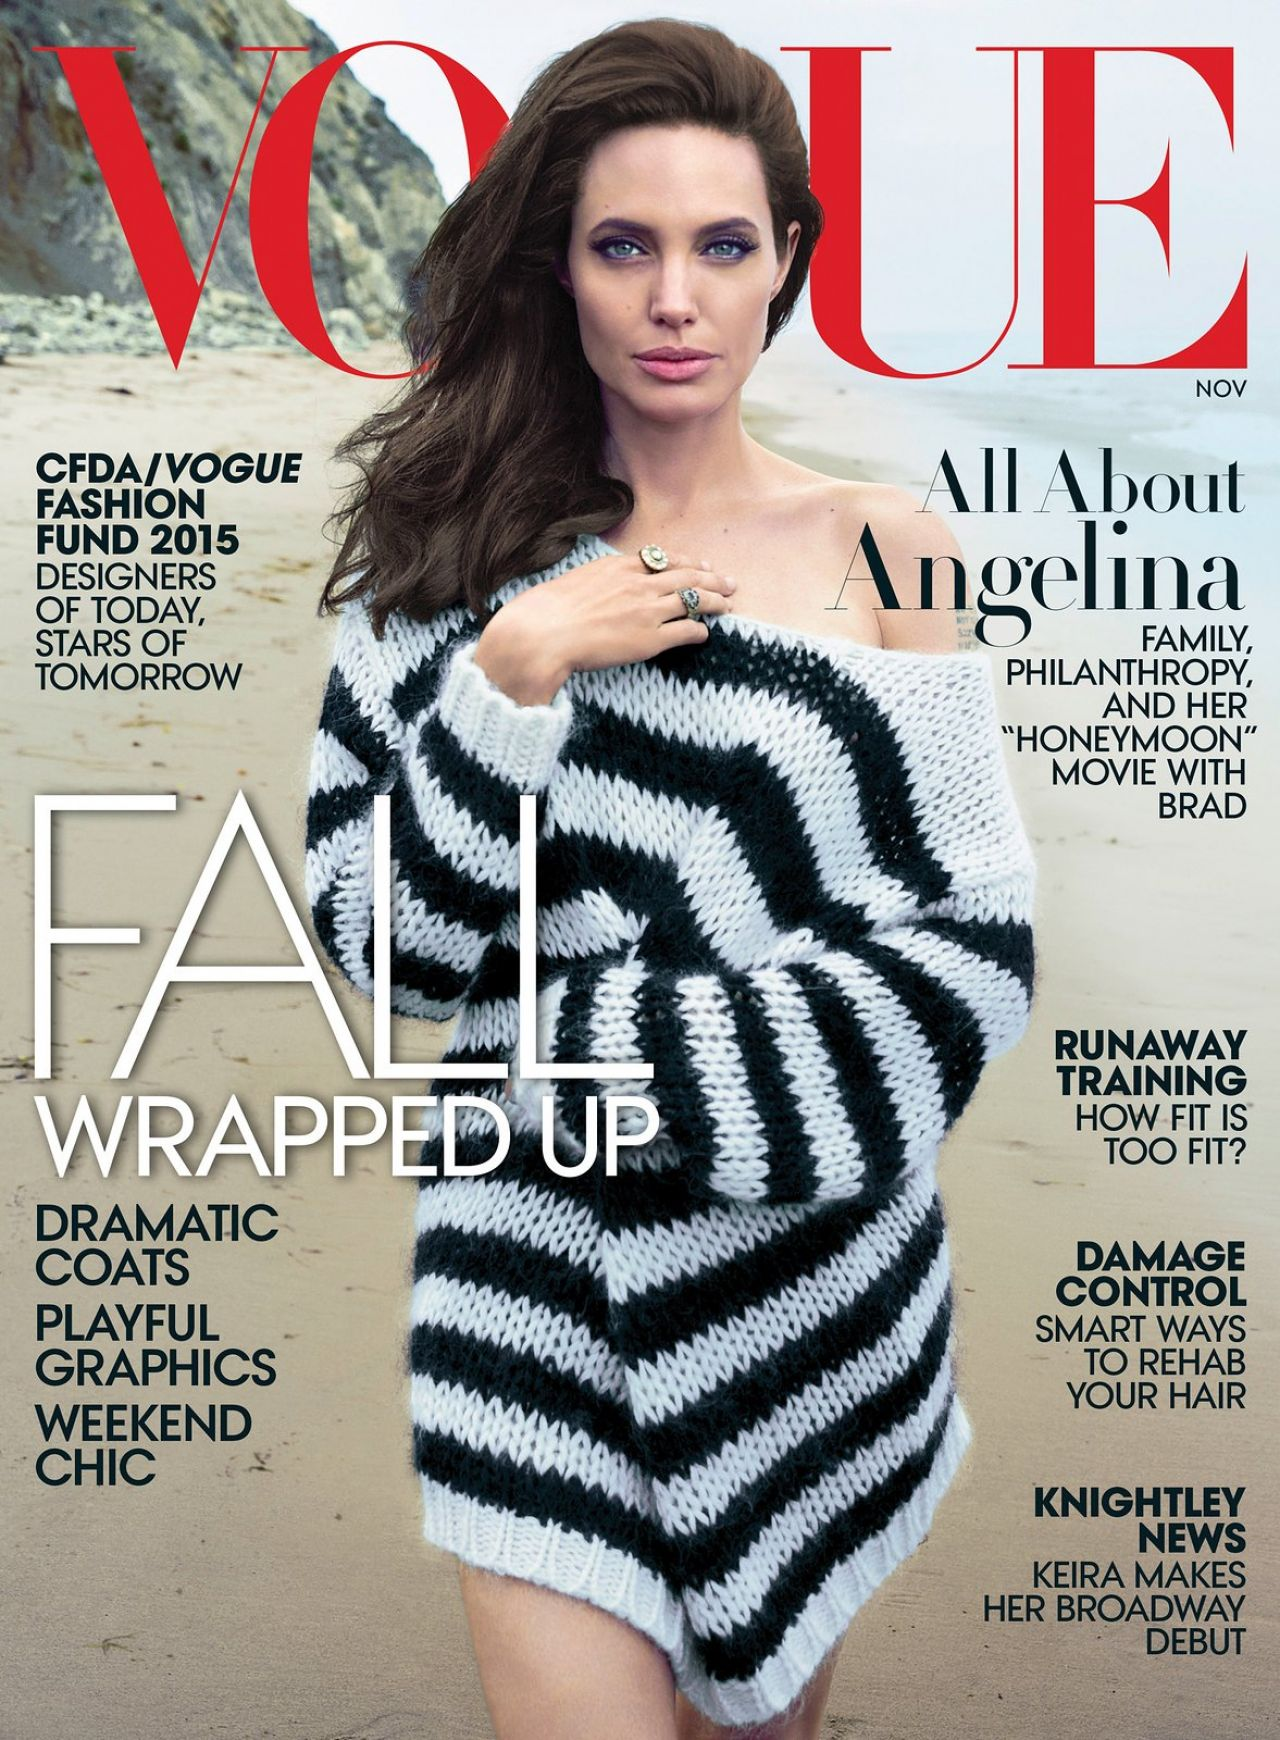 Vogue Magazine Subscription: Vogue Magazine November 2015 Cover